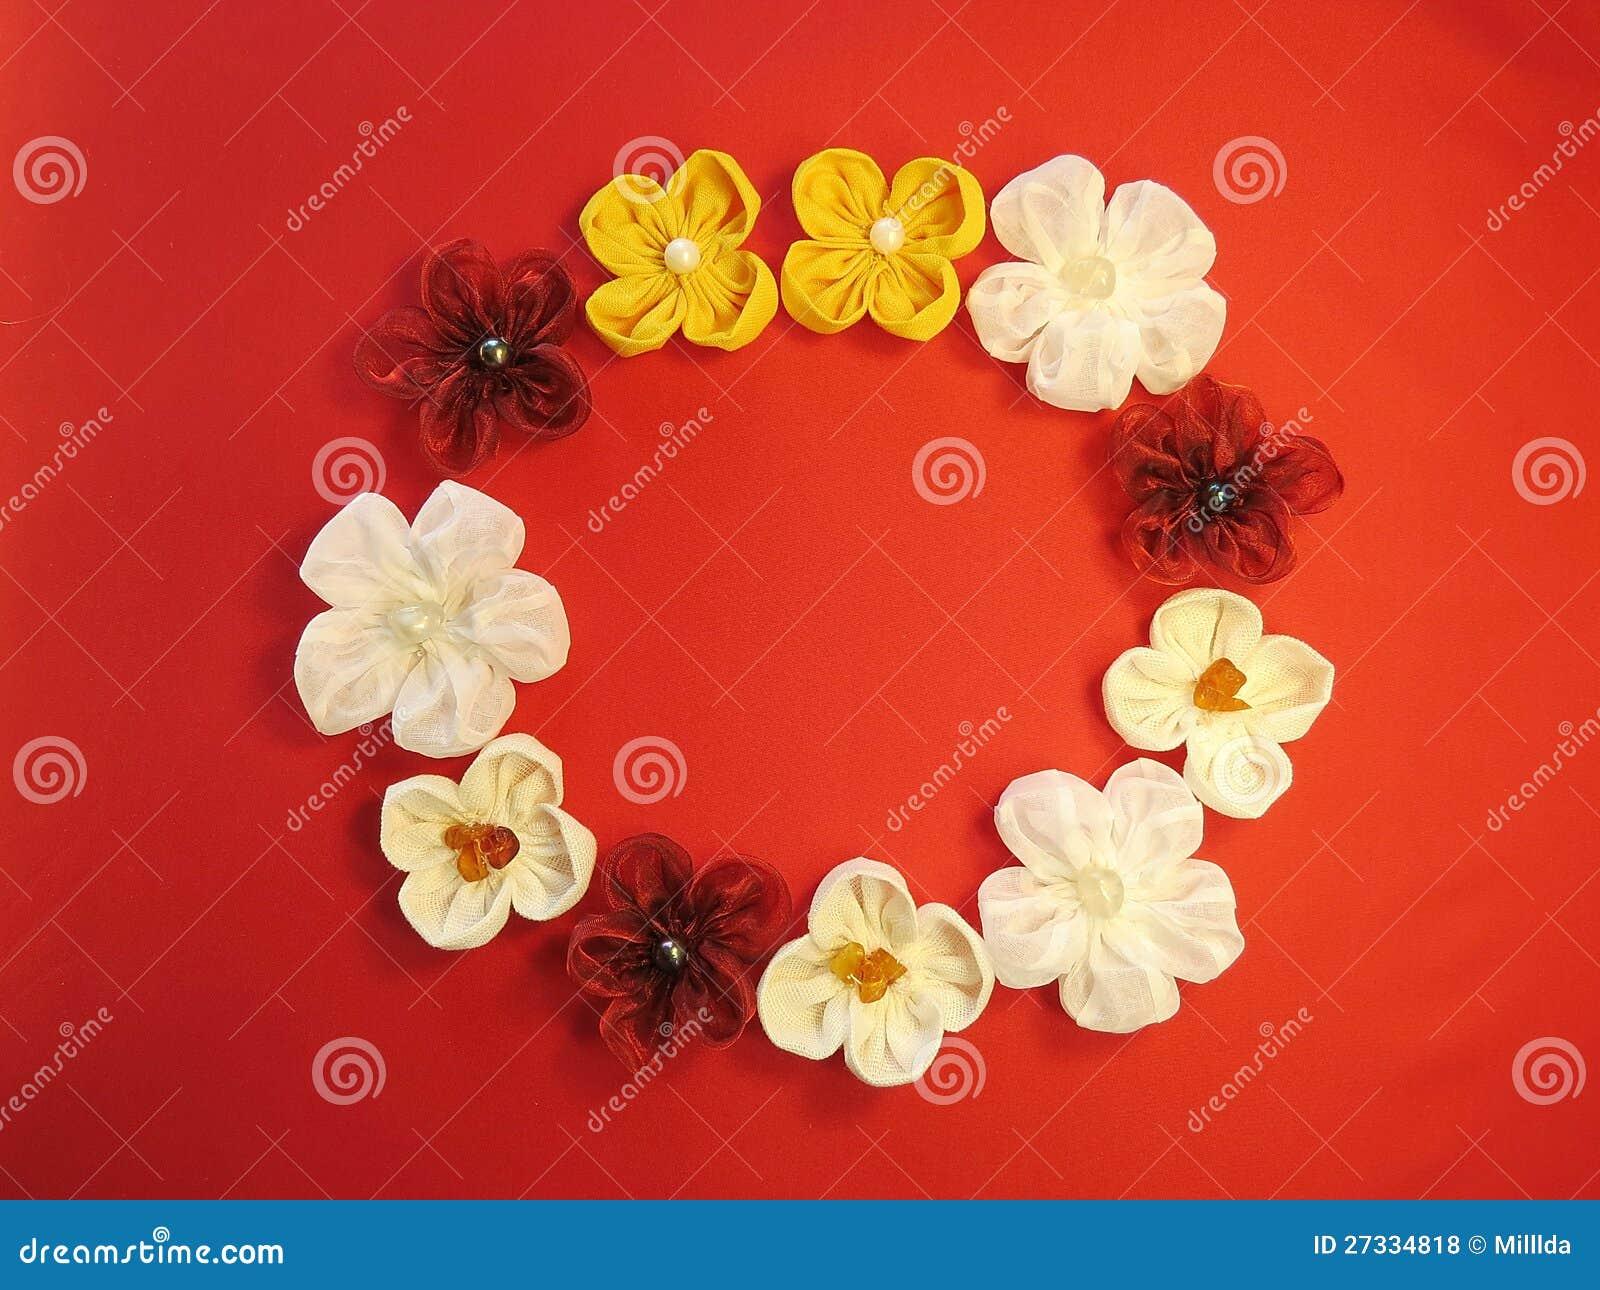 Guirlande de fleurs artificielles photos libres de droits for Guirlande fleurs artificielles